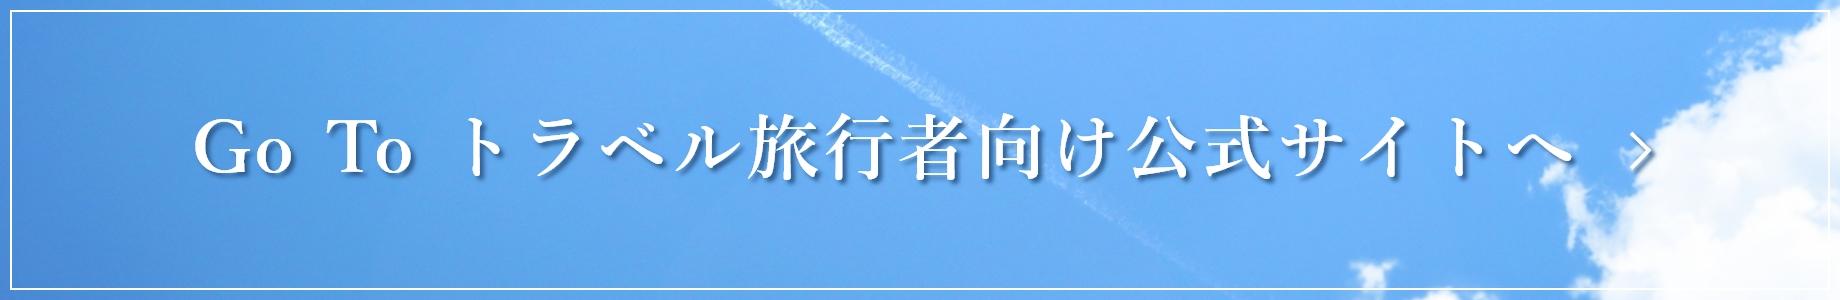 GoToトラベル旅行者向け公式サイトへ